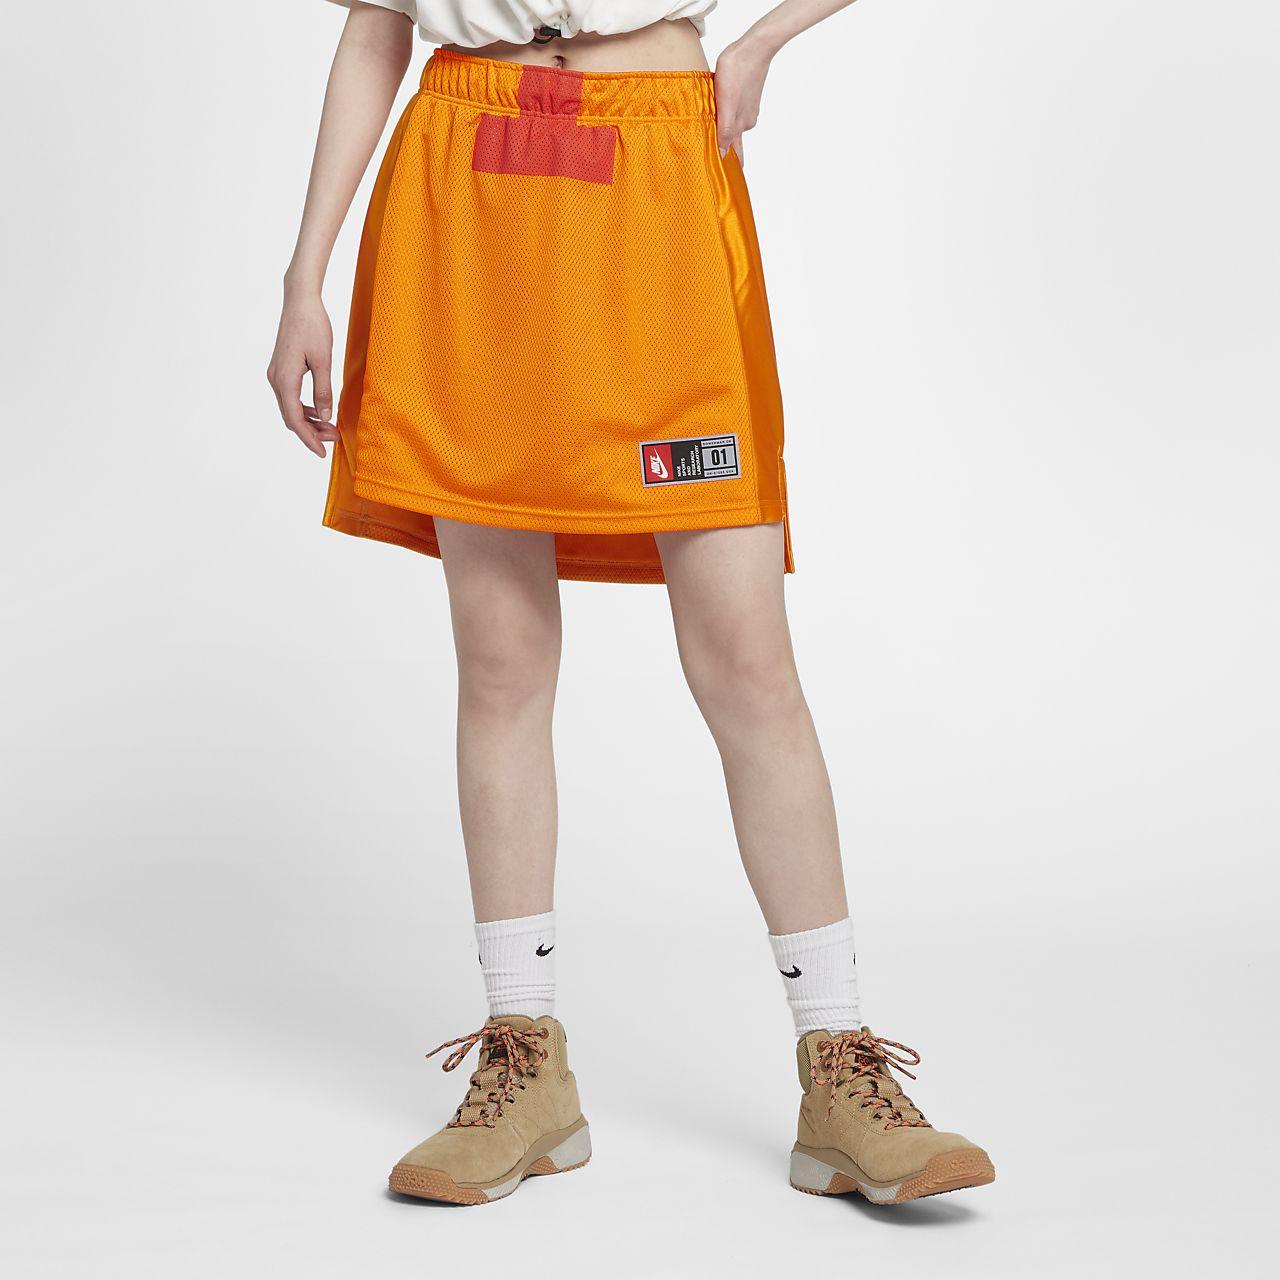 NikeLab Collection Women's Football Skirt